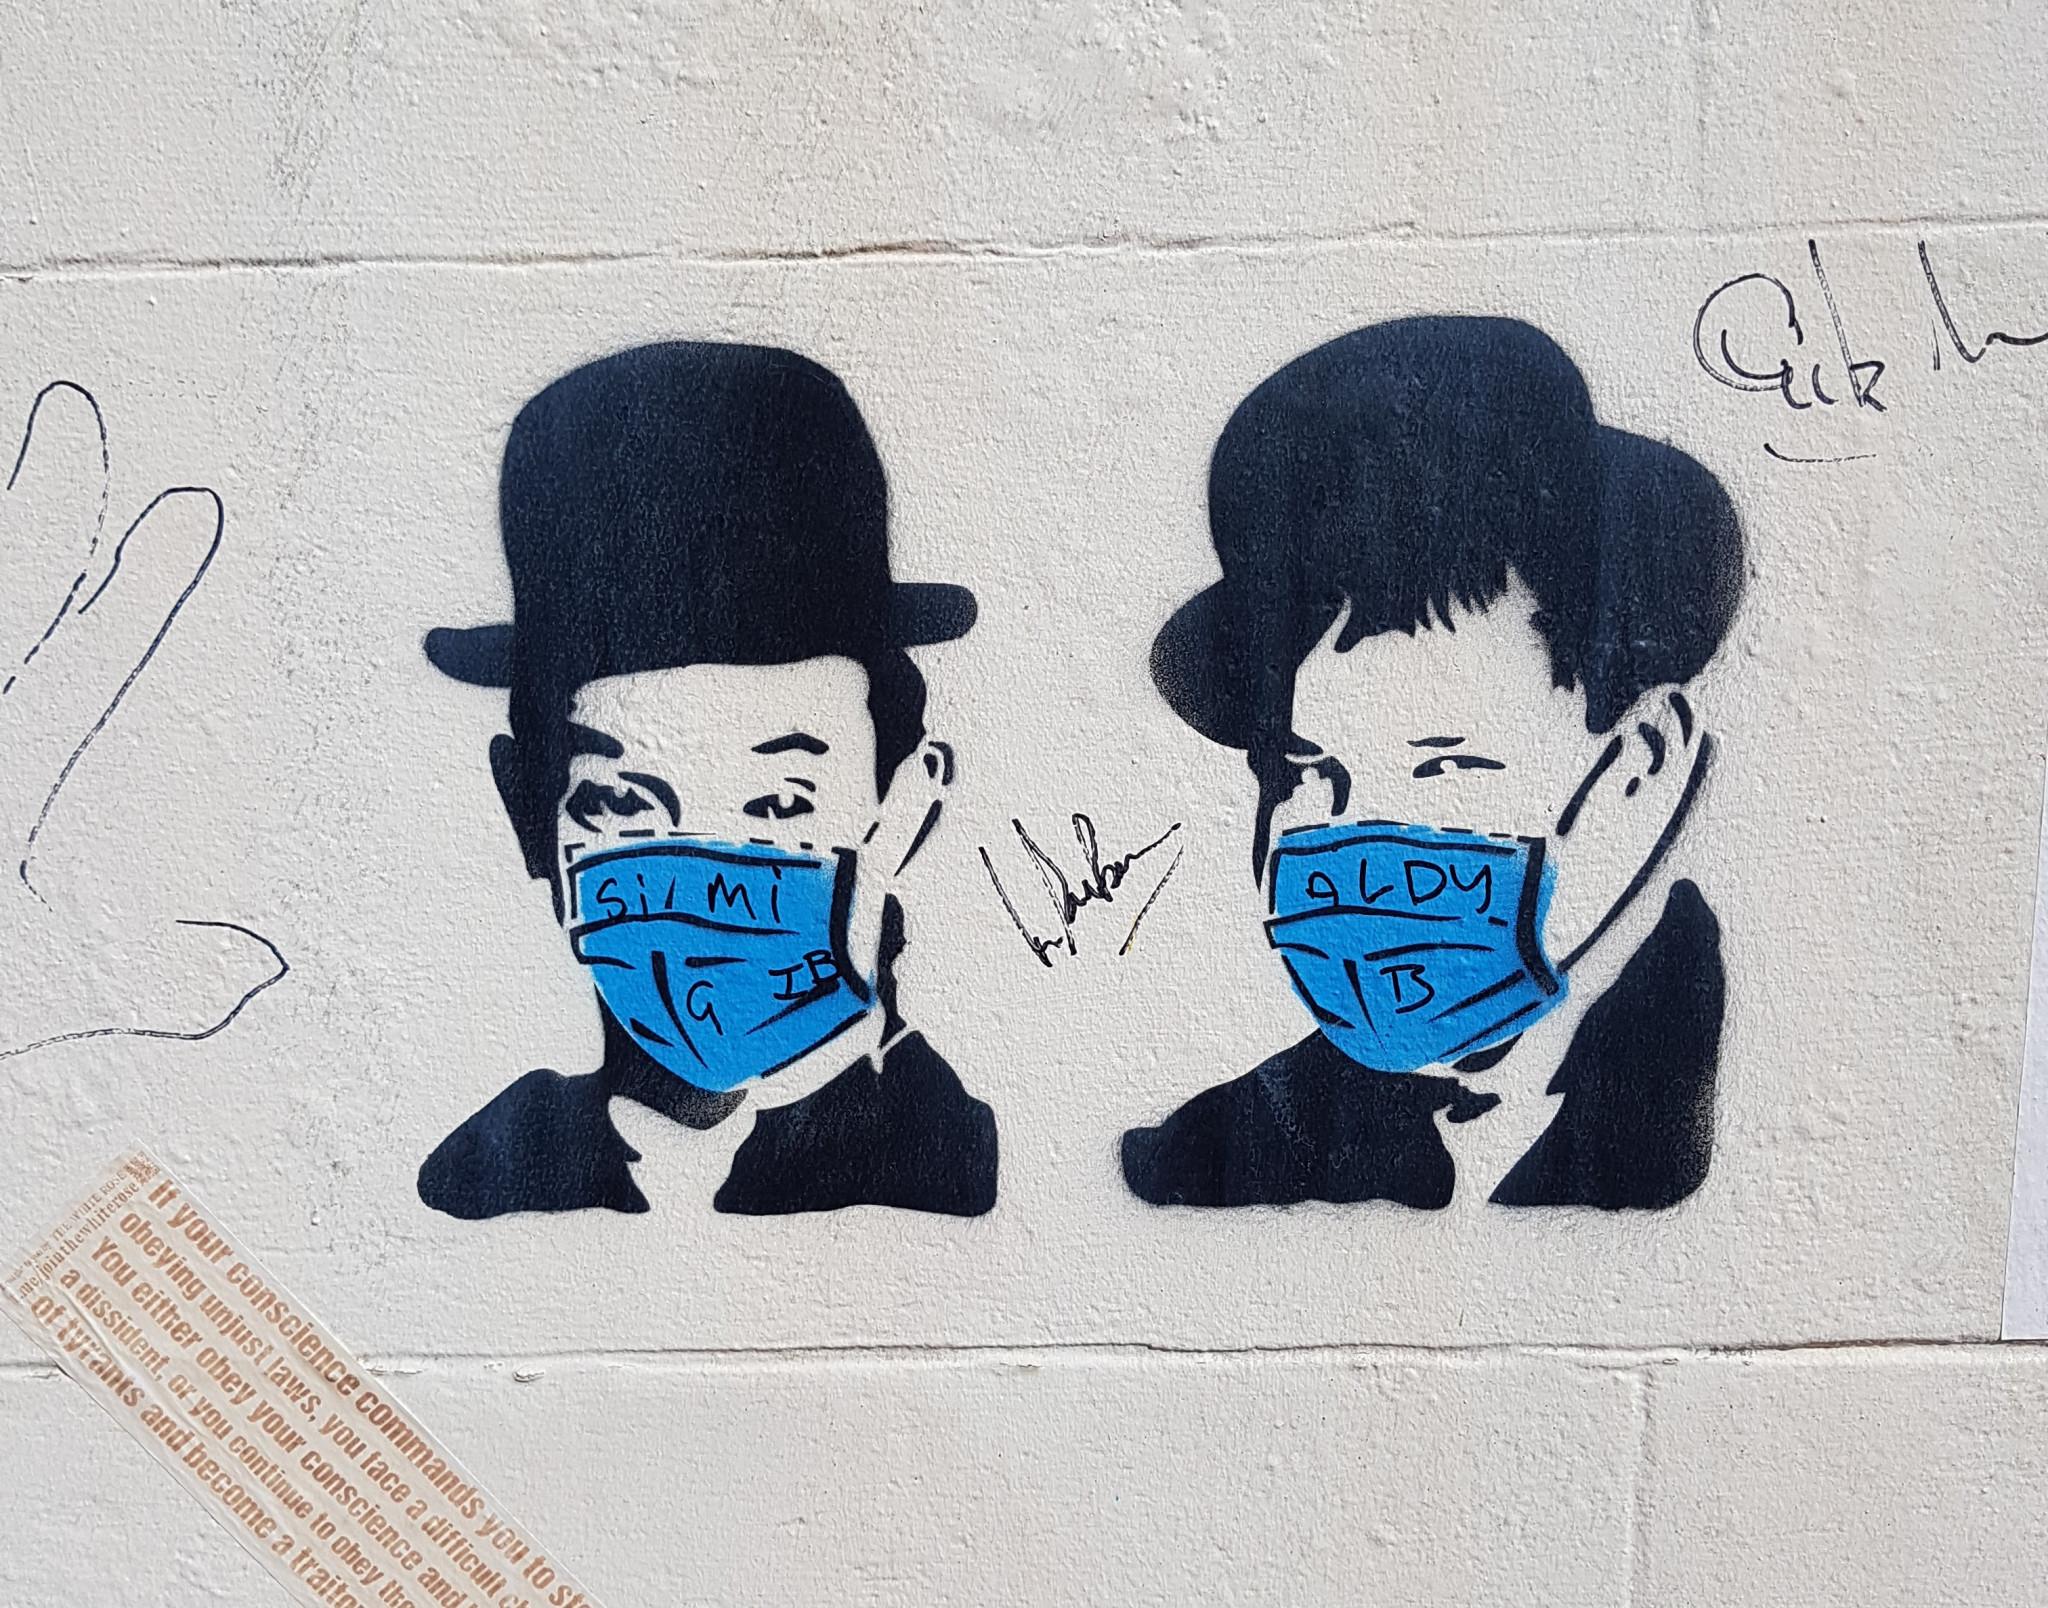 Pandemic-themed Laurel and Hardy graffiti seen in Ulverston ©David Owen